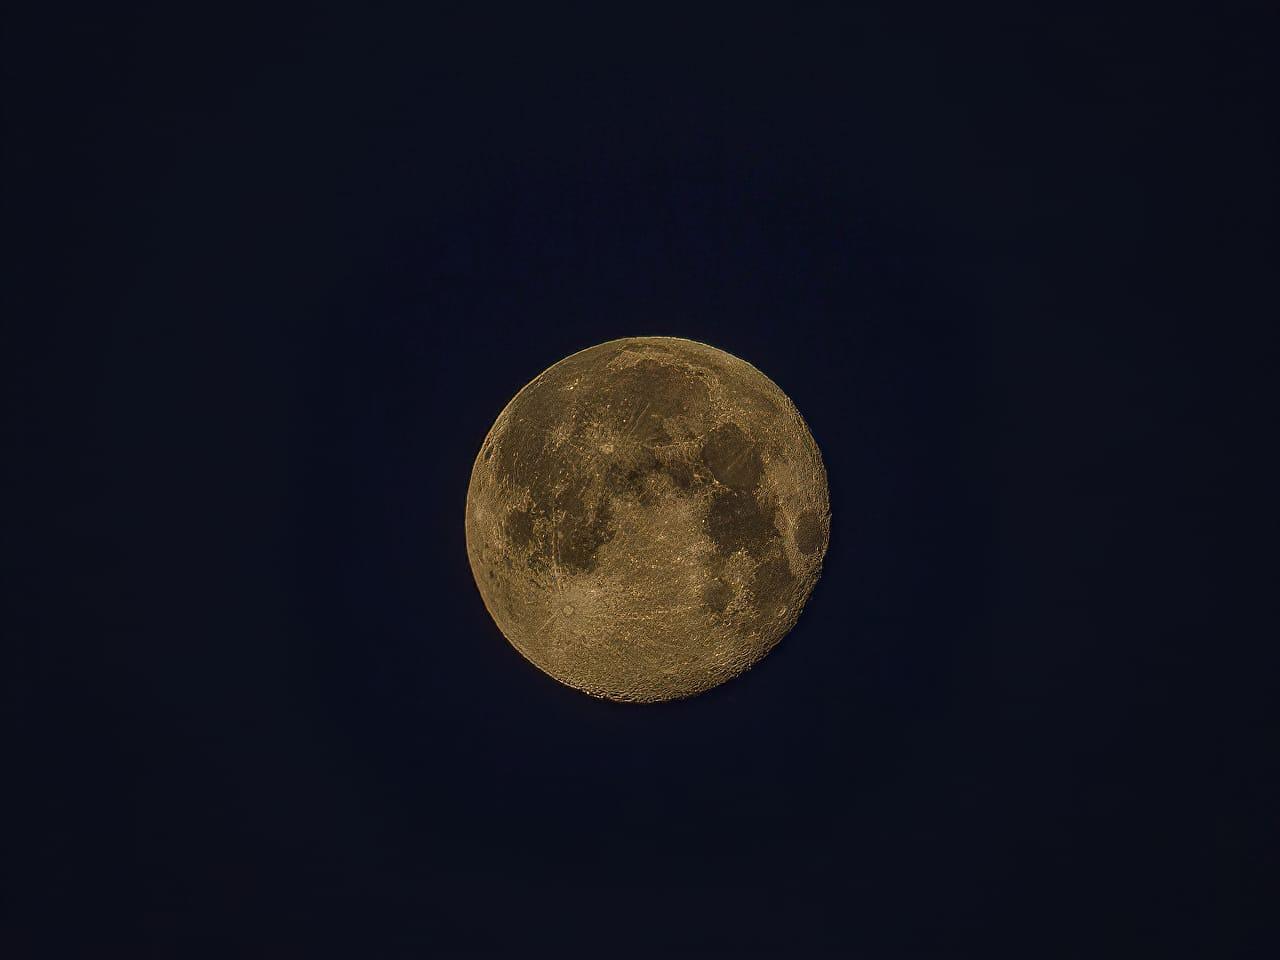 P1000 Lunar Photography 1000mm Jeff Wendorff